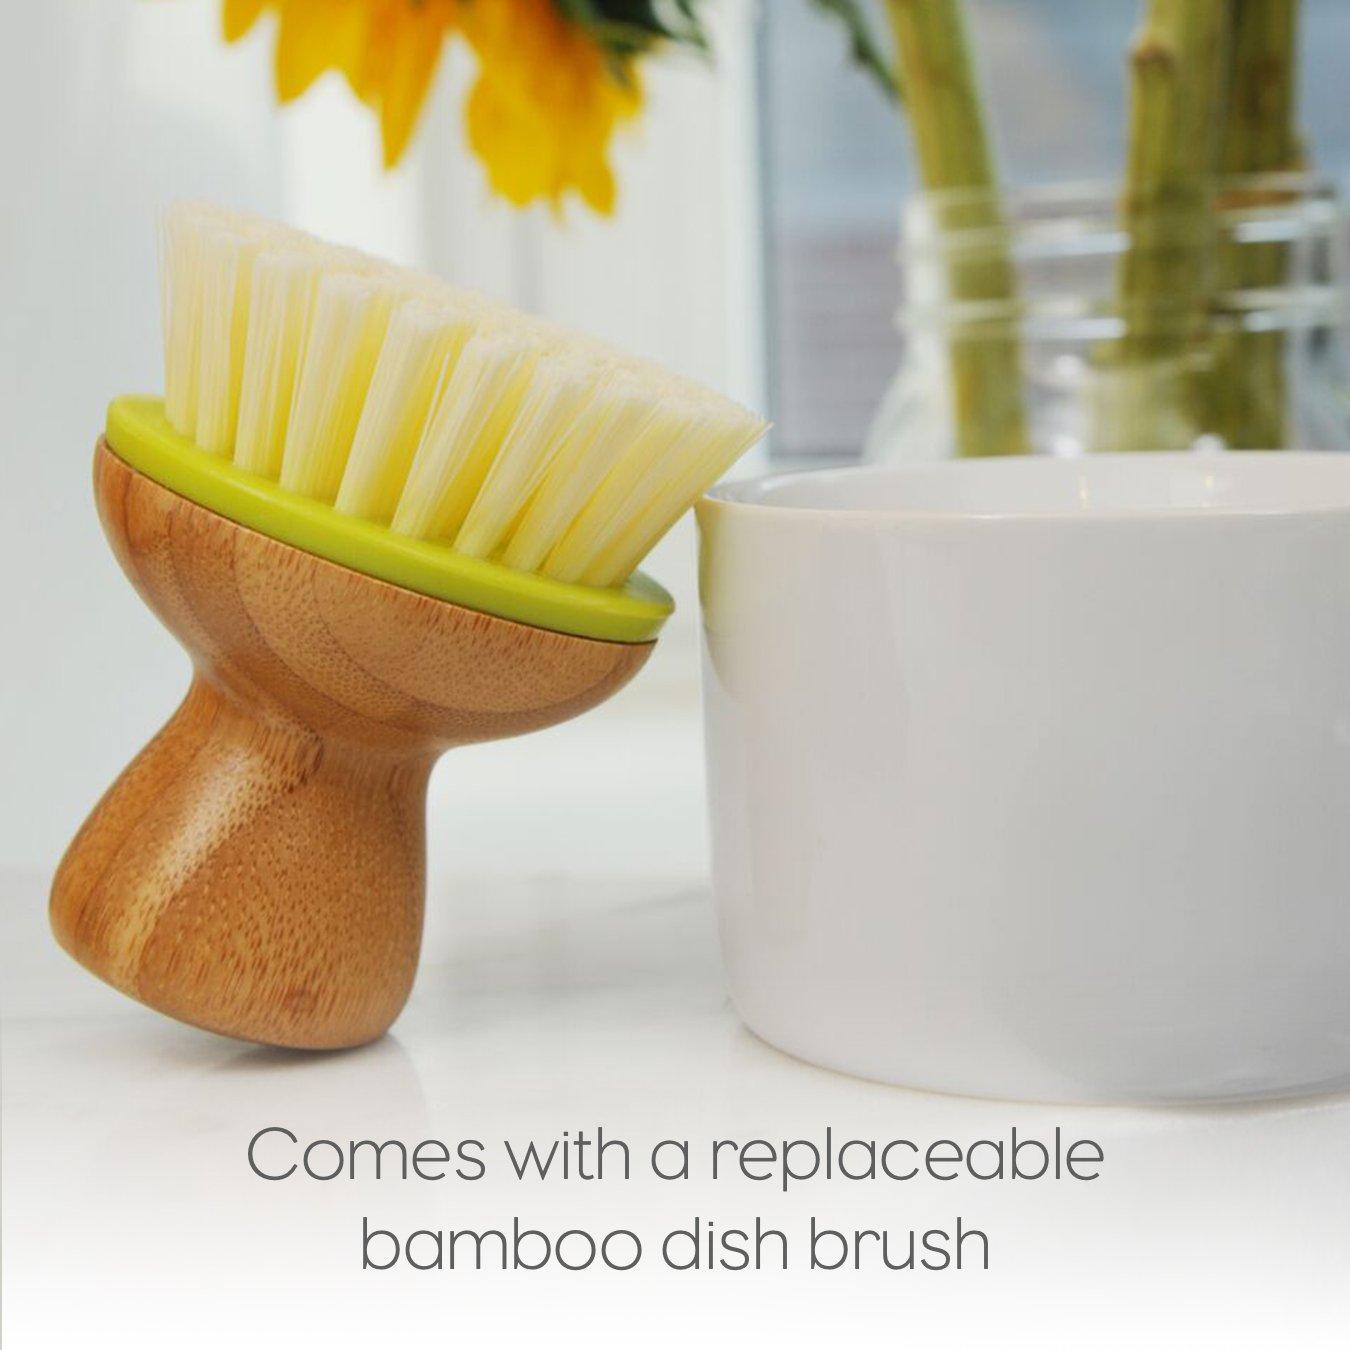 Full Circle Bubble Up Ceramic Soap Dispenser & Dish Brush w Bamboo Handle, Green/White by Full Circle (Image #6)